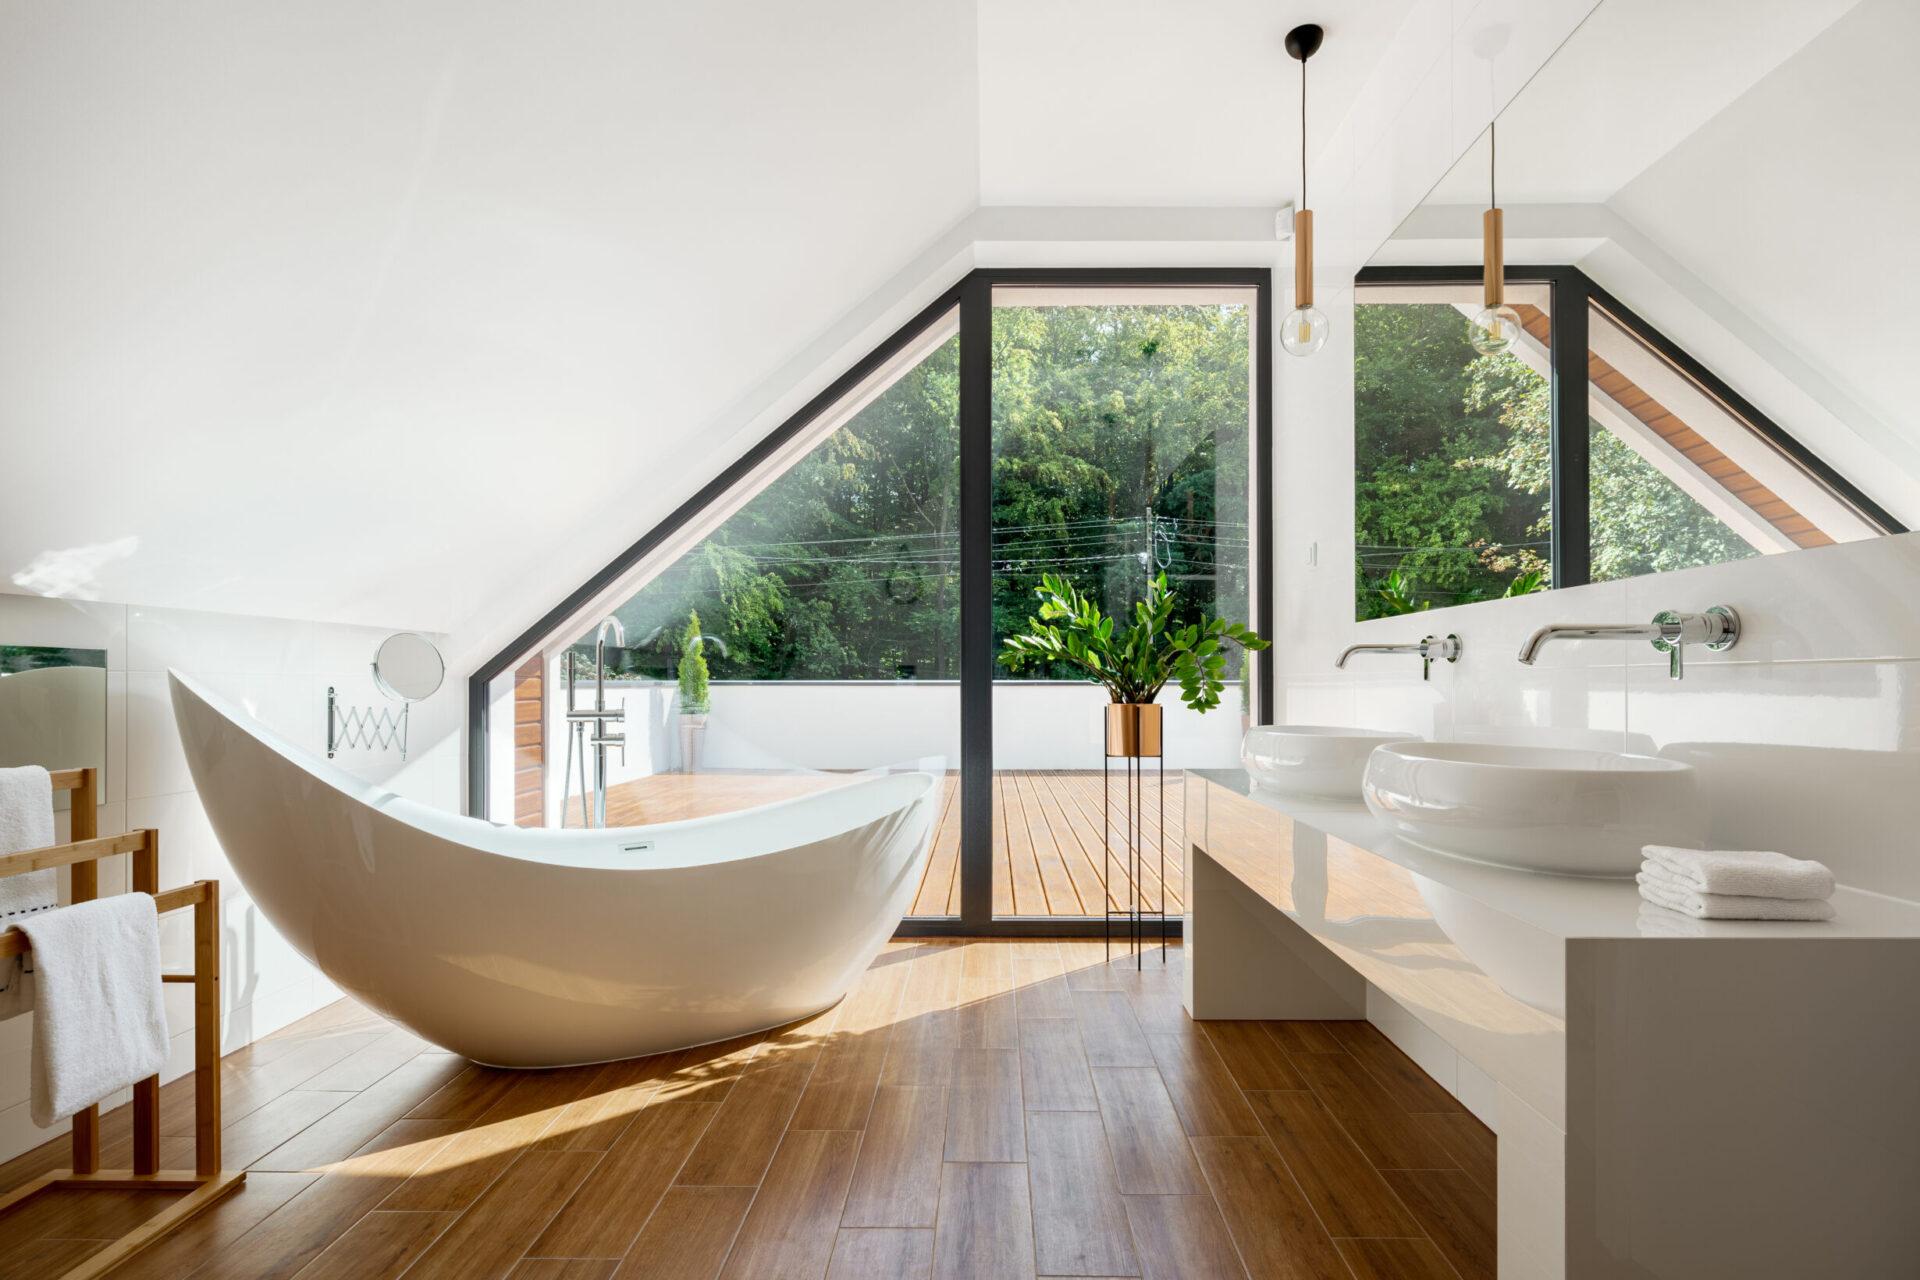 Elegant attic bathroom with stylish bathtub, wooden floor and balcony door